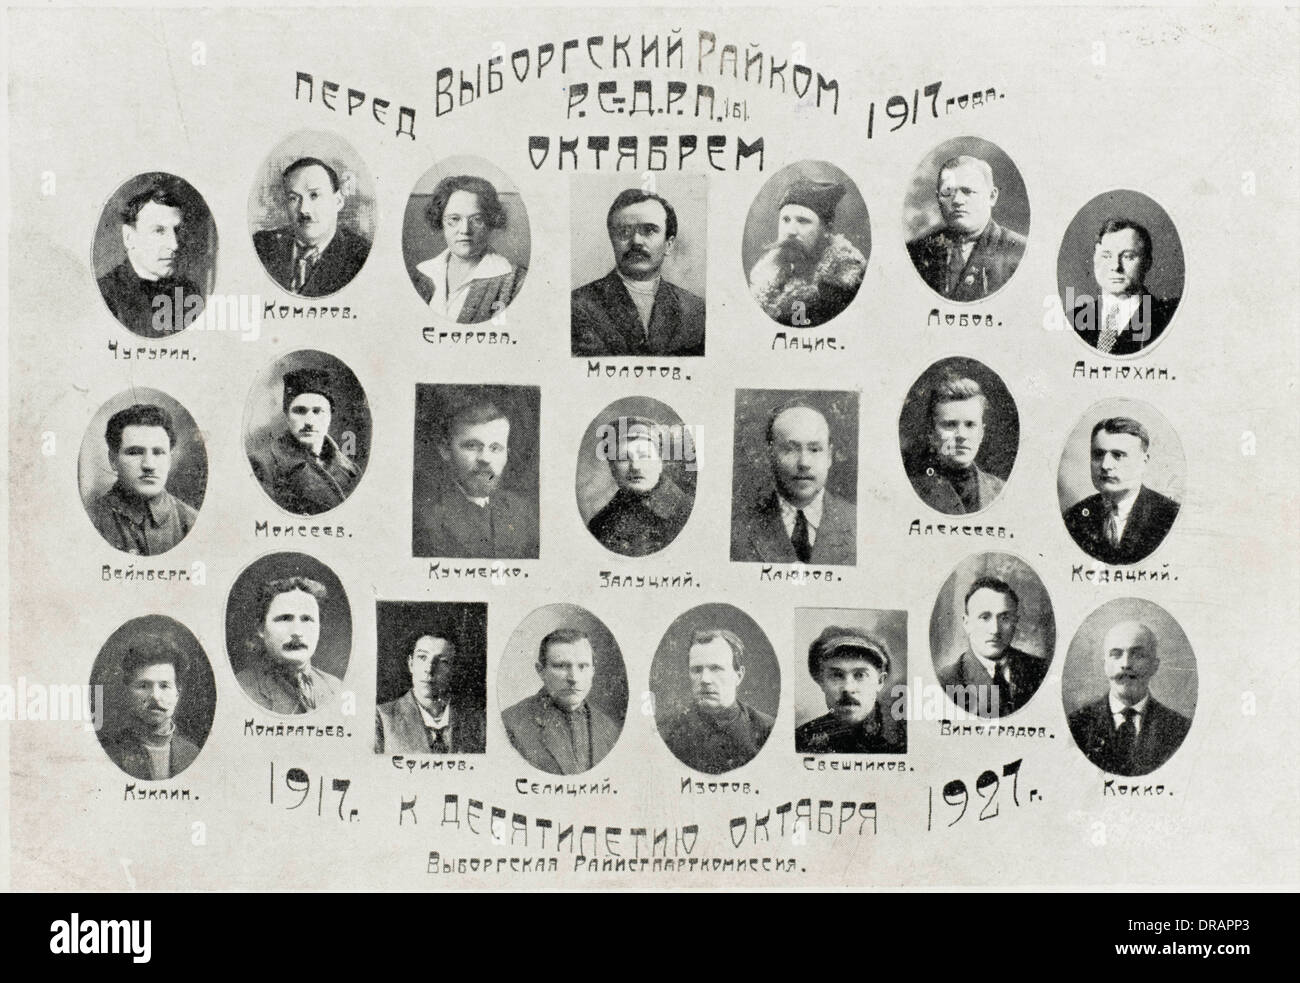 Commemorative card for October Revolution - Stock Image